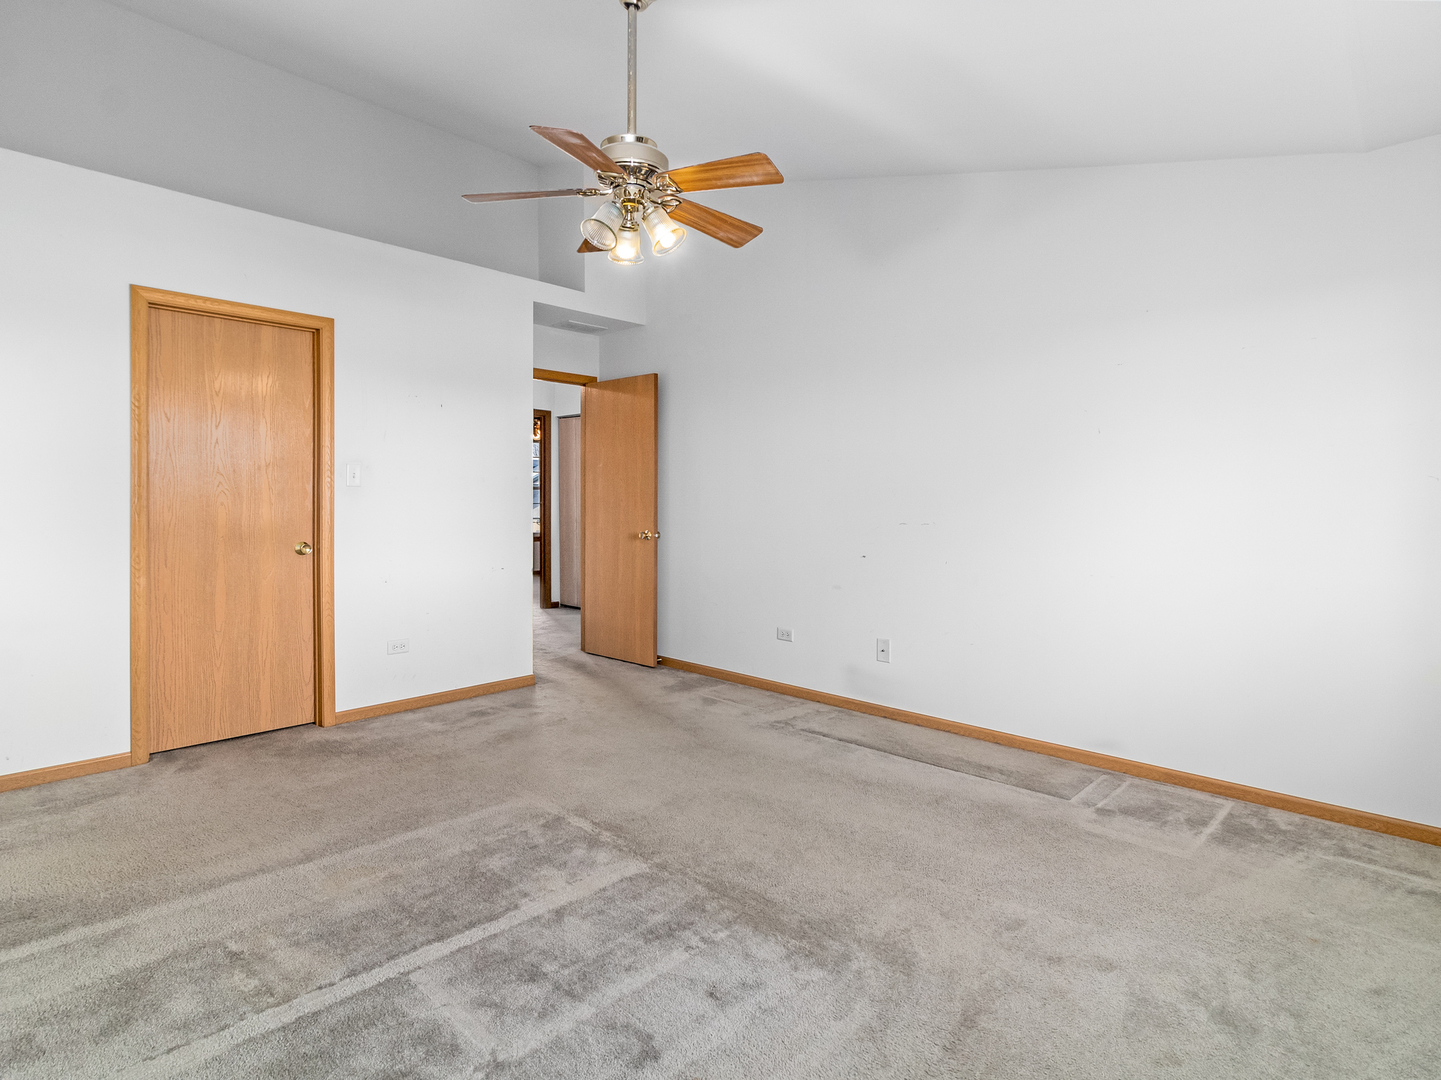 26546 West Fox, Channahon, Illinois, 60410